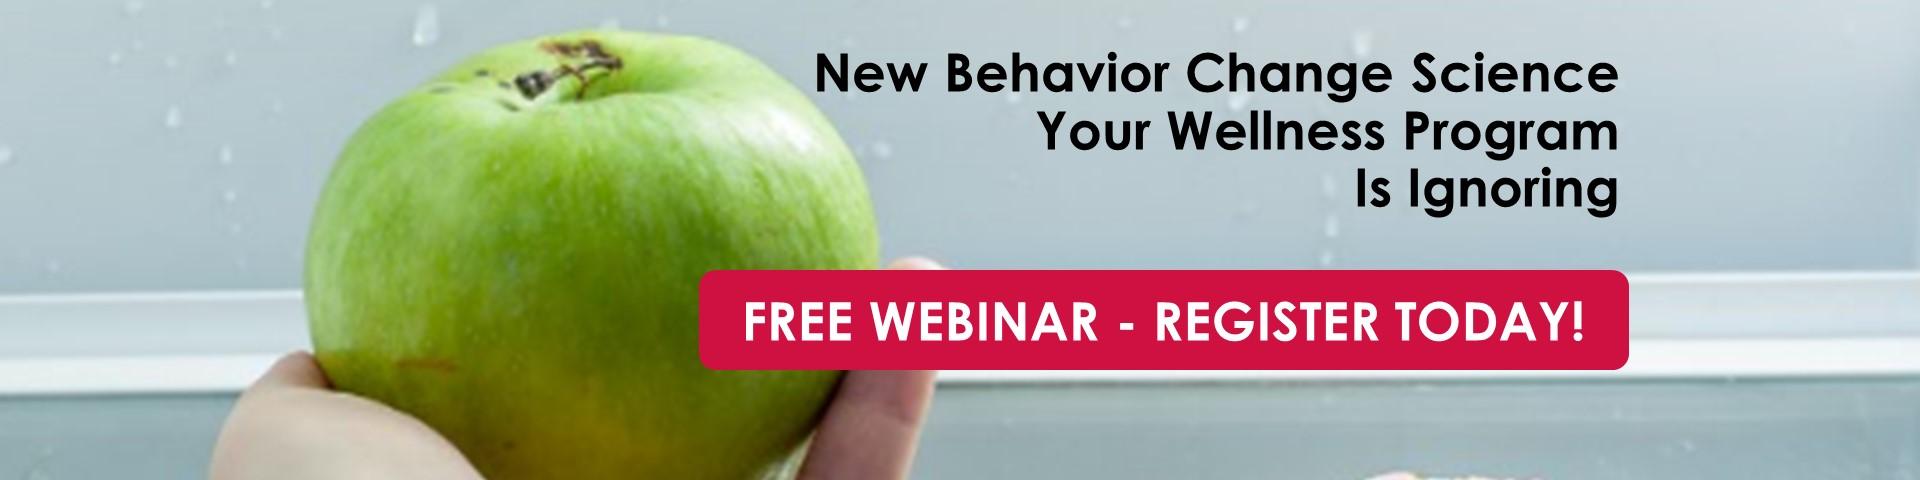 New-Behavior-Change-Science_Banner_Website